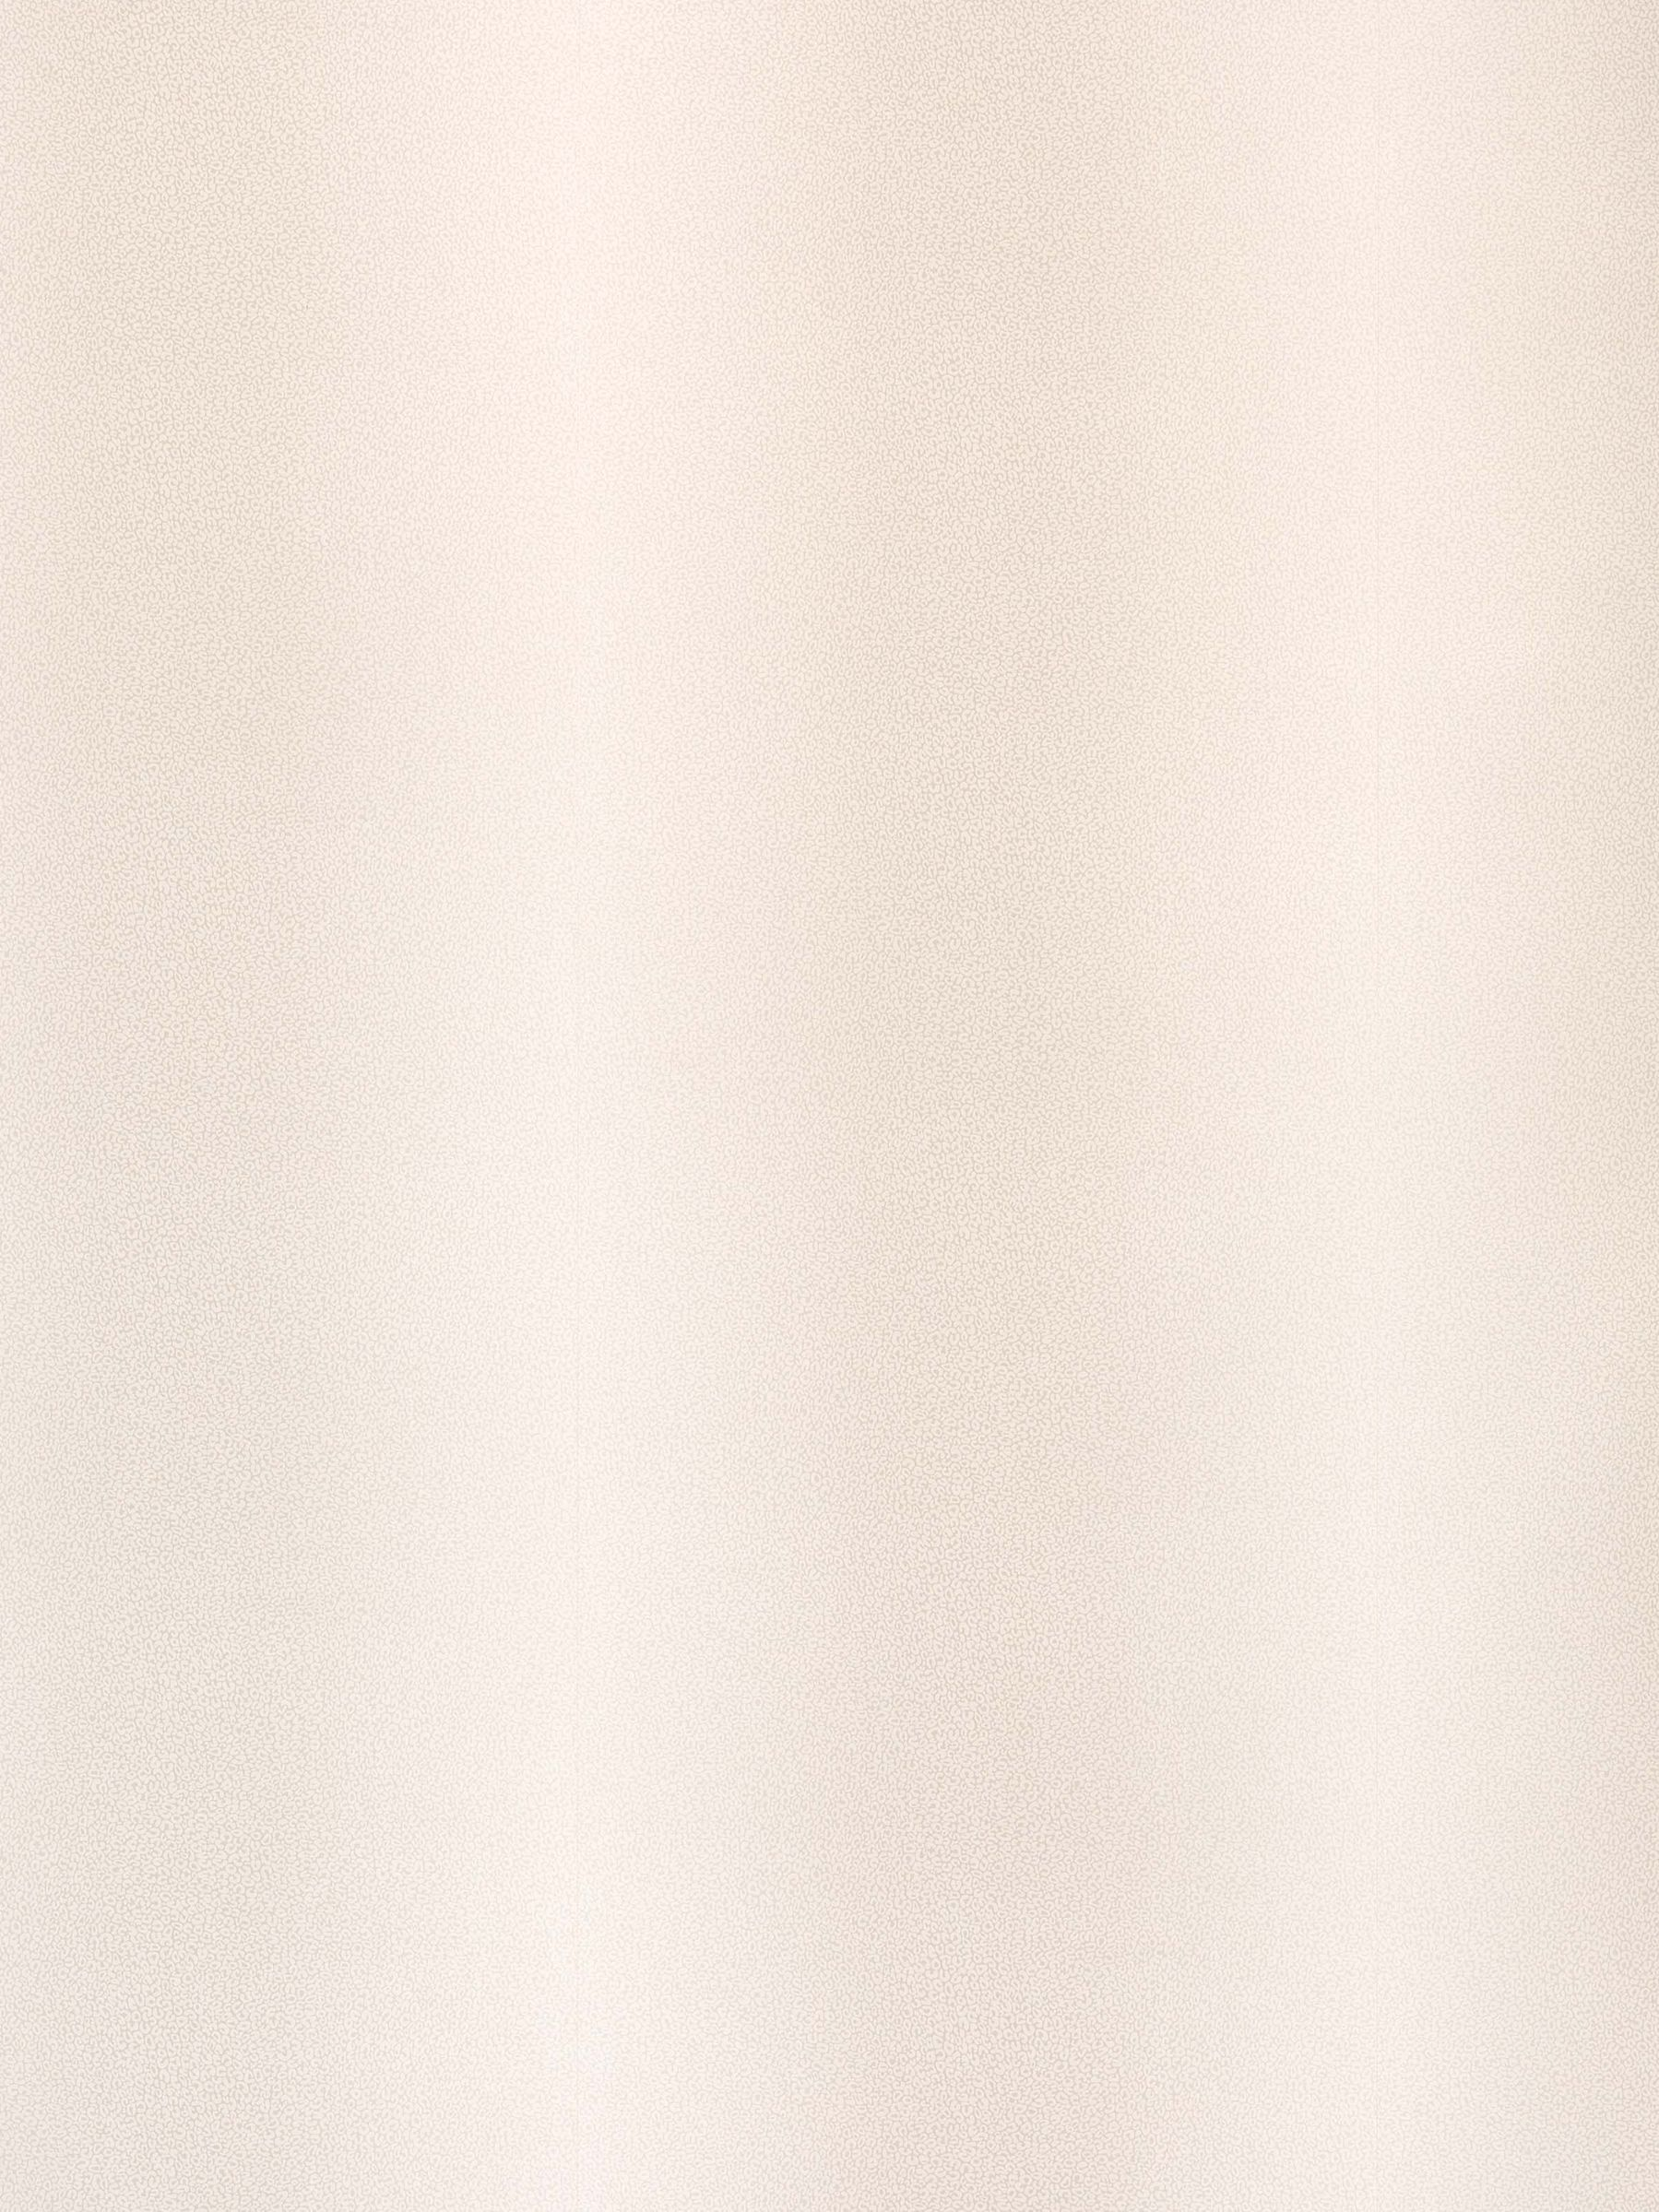 Matthew Williamson Matthew Williamson Ocelot Ombre Wallpaper